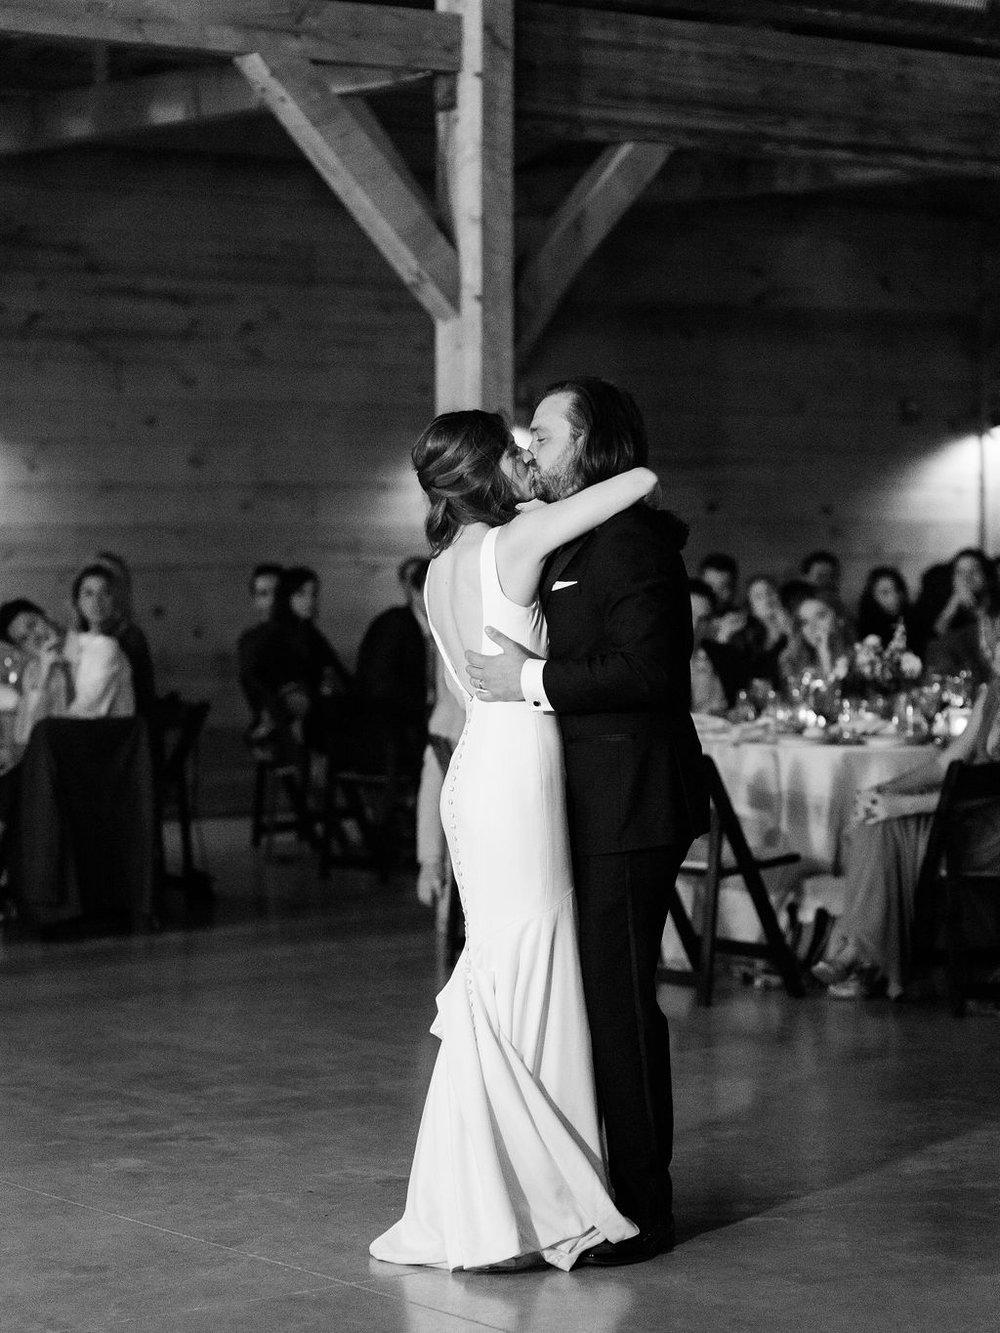 Austin-Texas-Wedding-Photographer-Addison-Grove-Film-144.jpg